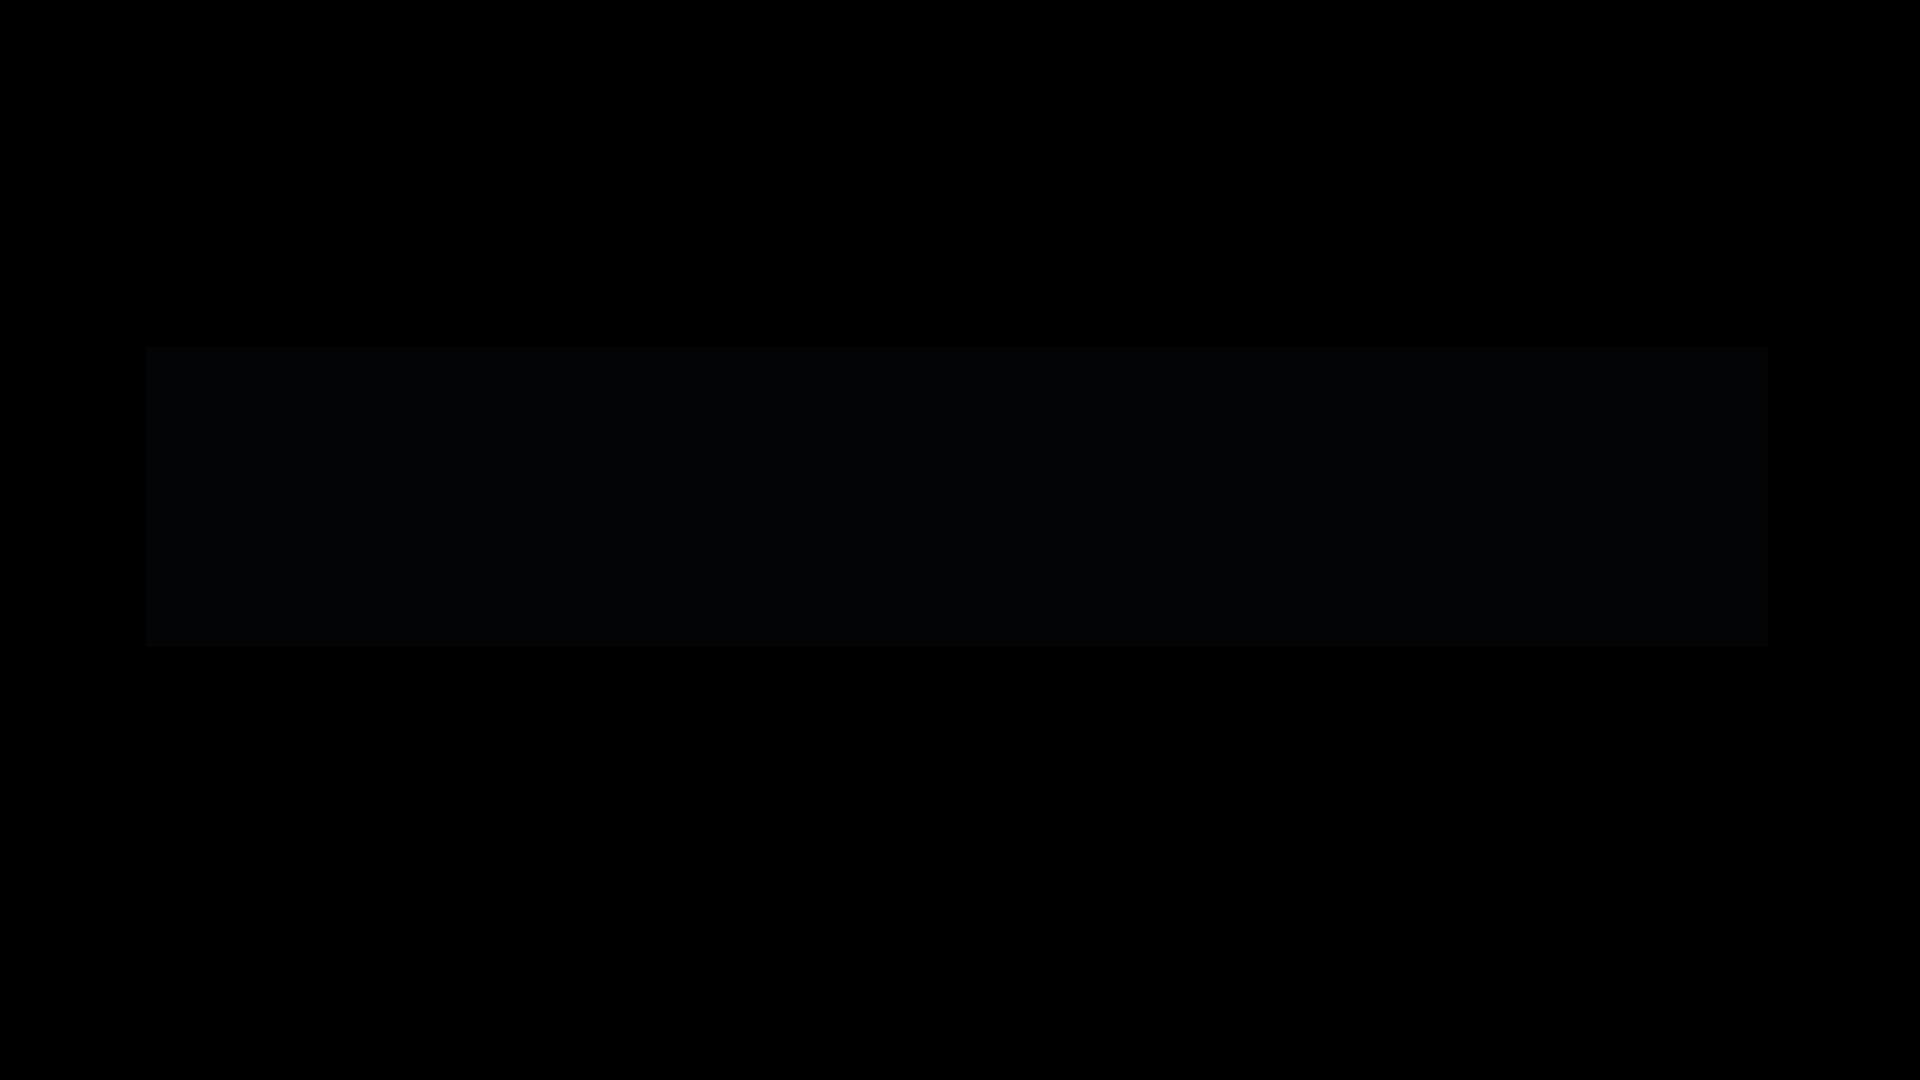 kartouch_logo_wit